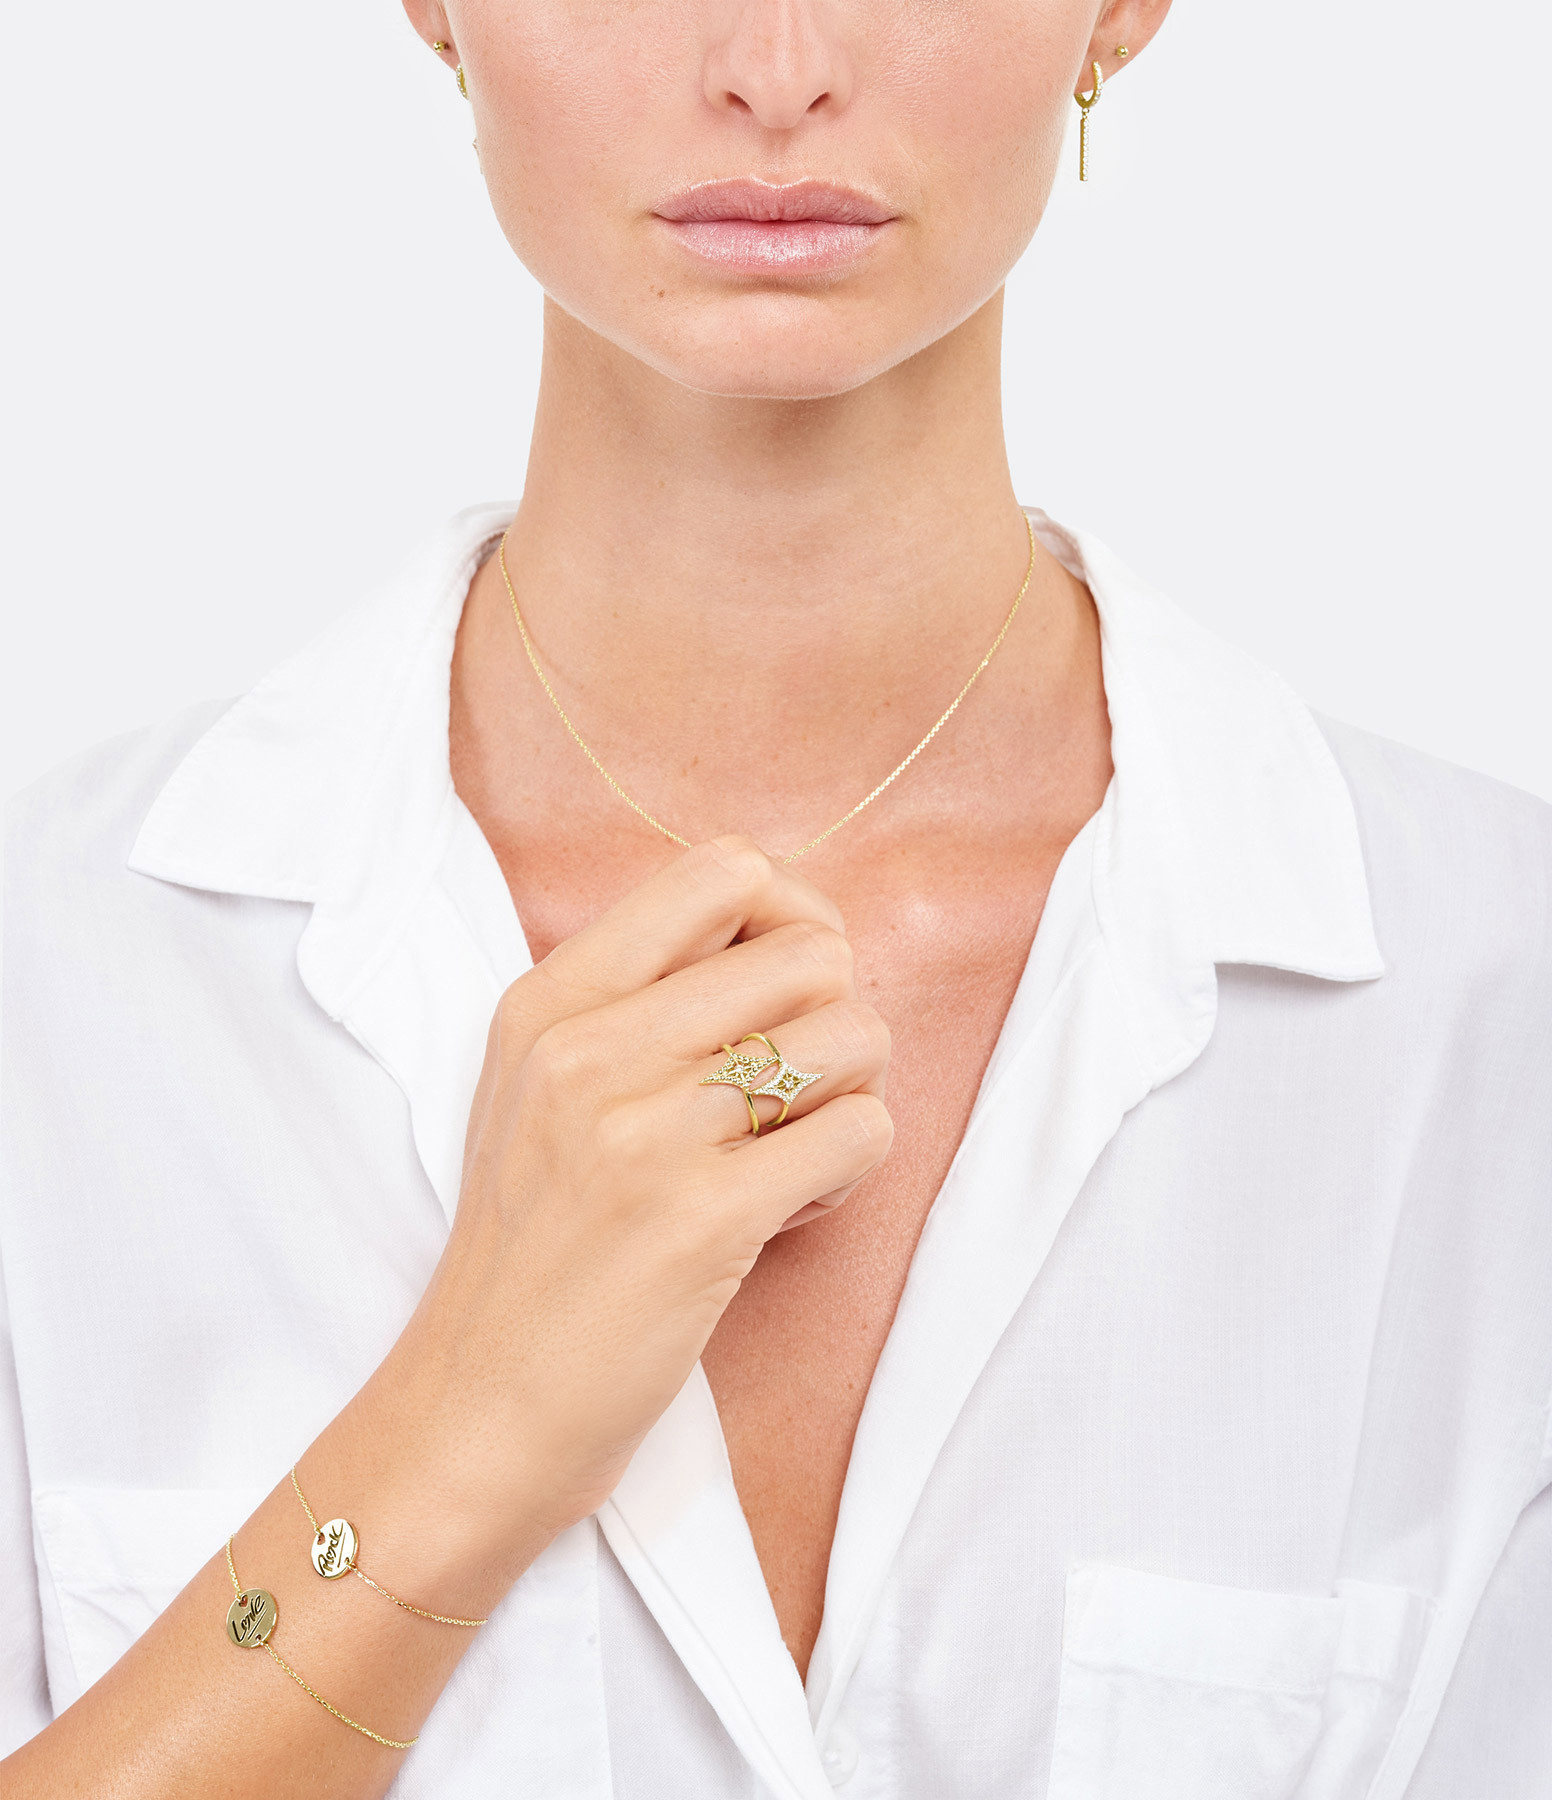 NAVA JOAILLERIE - Bague Mini-Cheyenne Losange Diamants Or Jaune